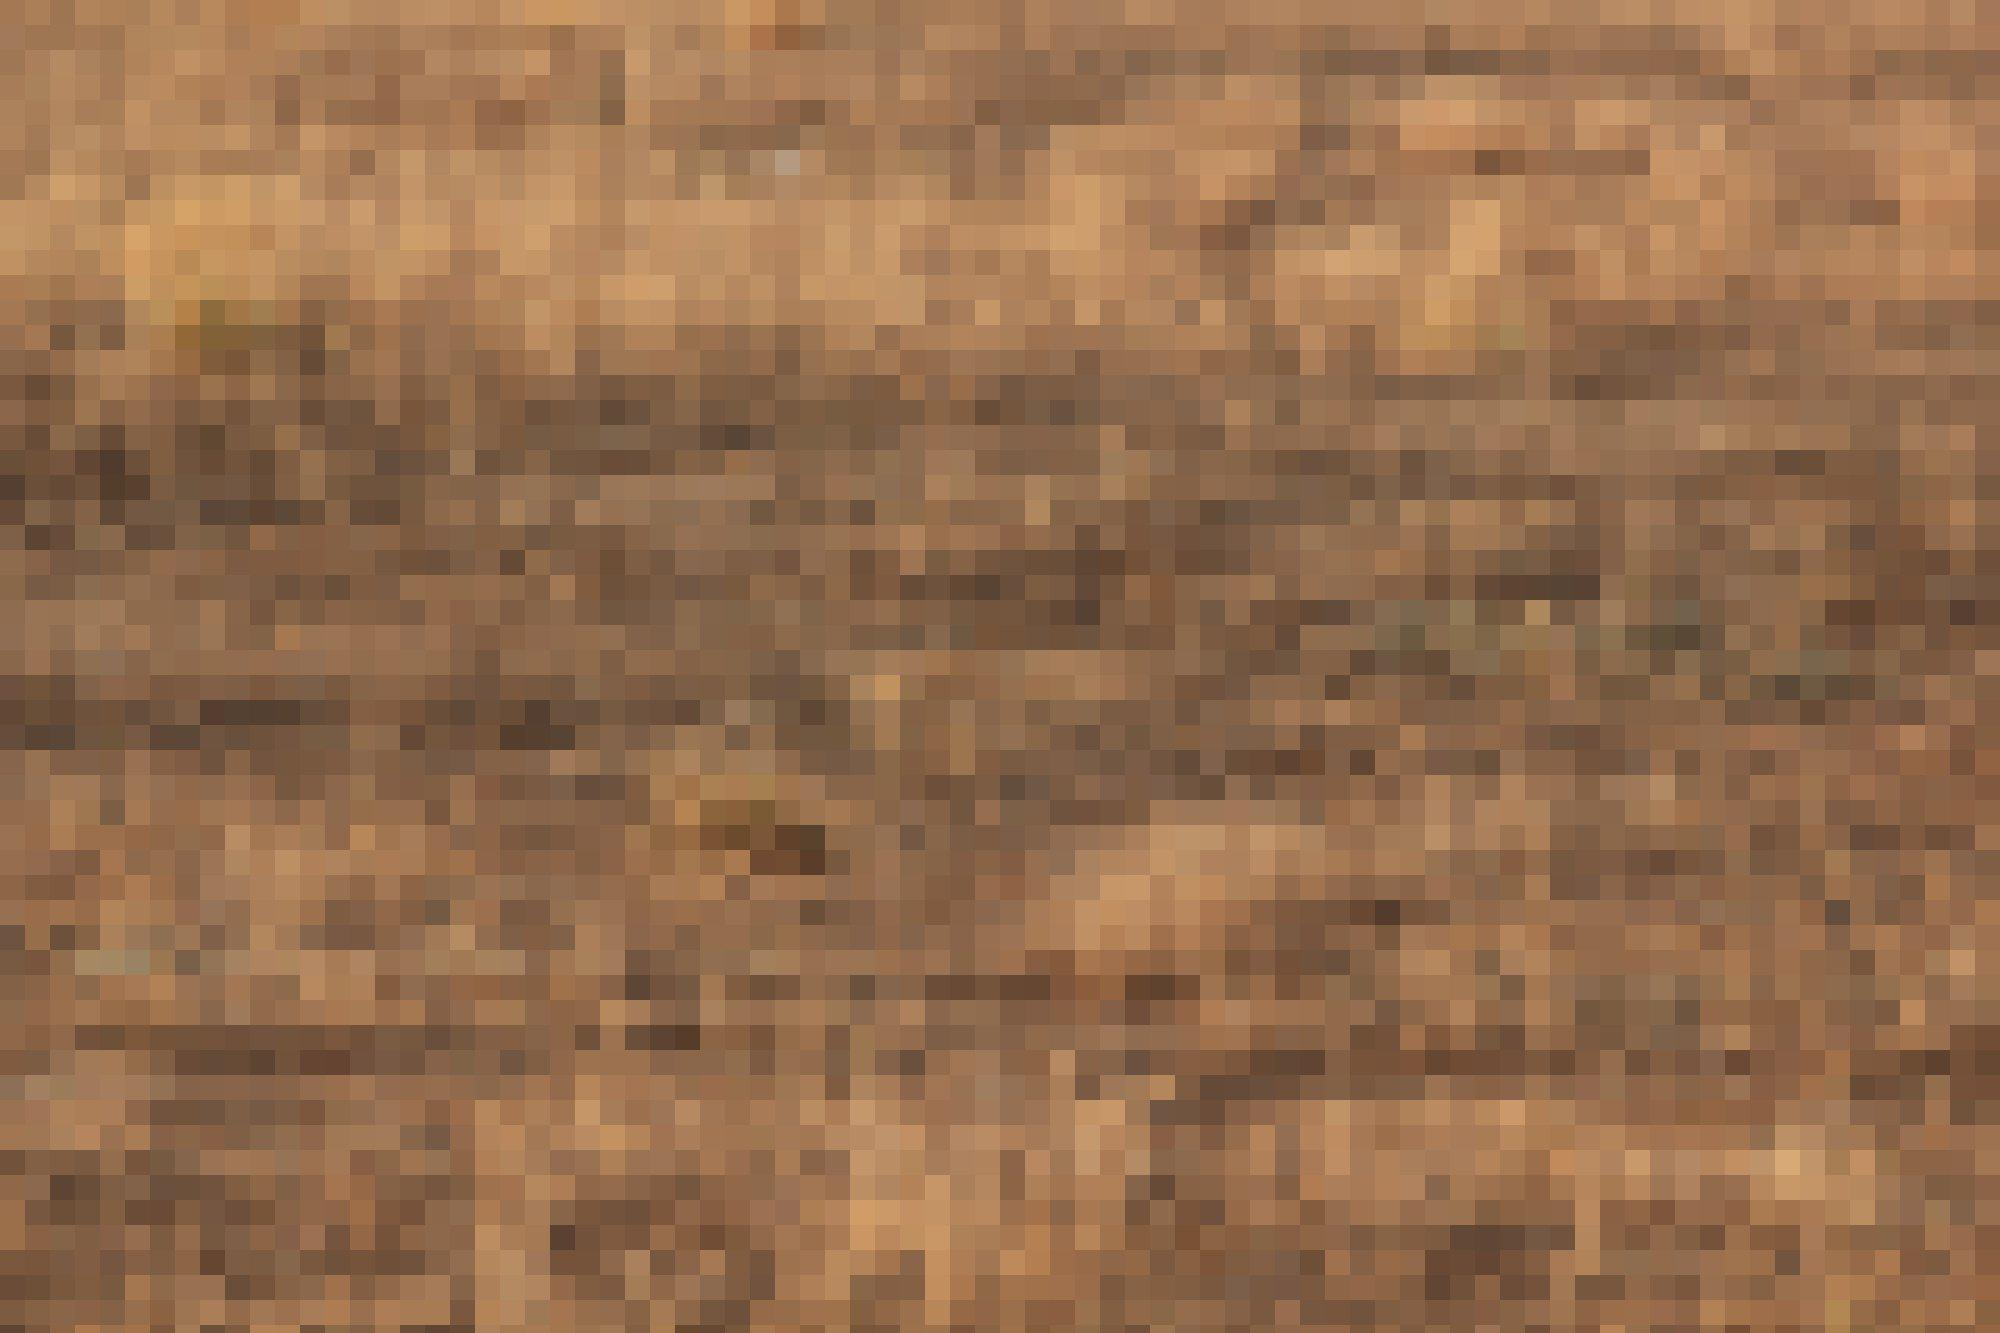 Trockener Grasboden mit Eule